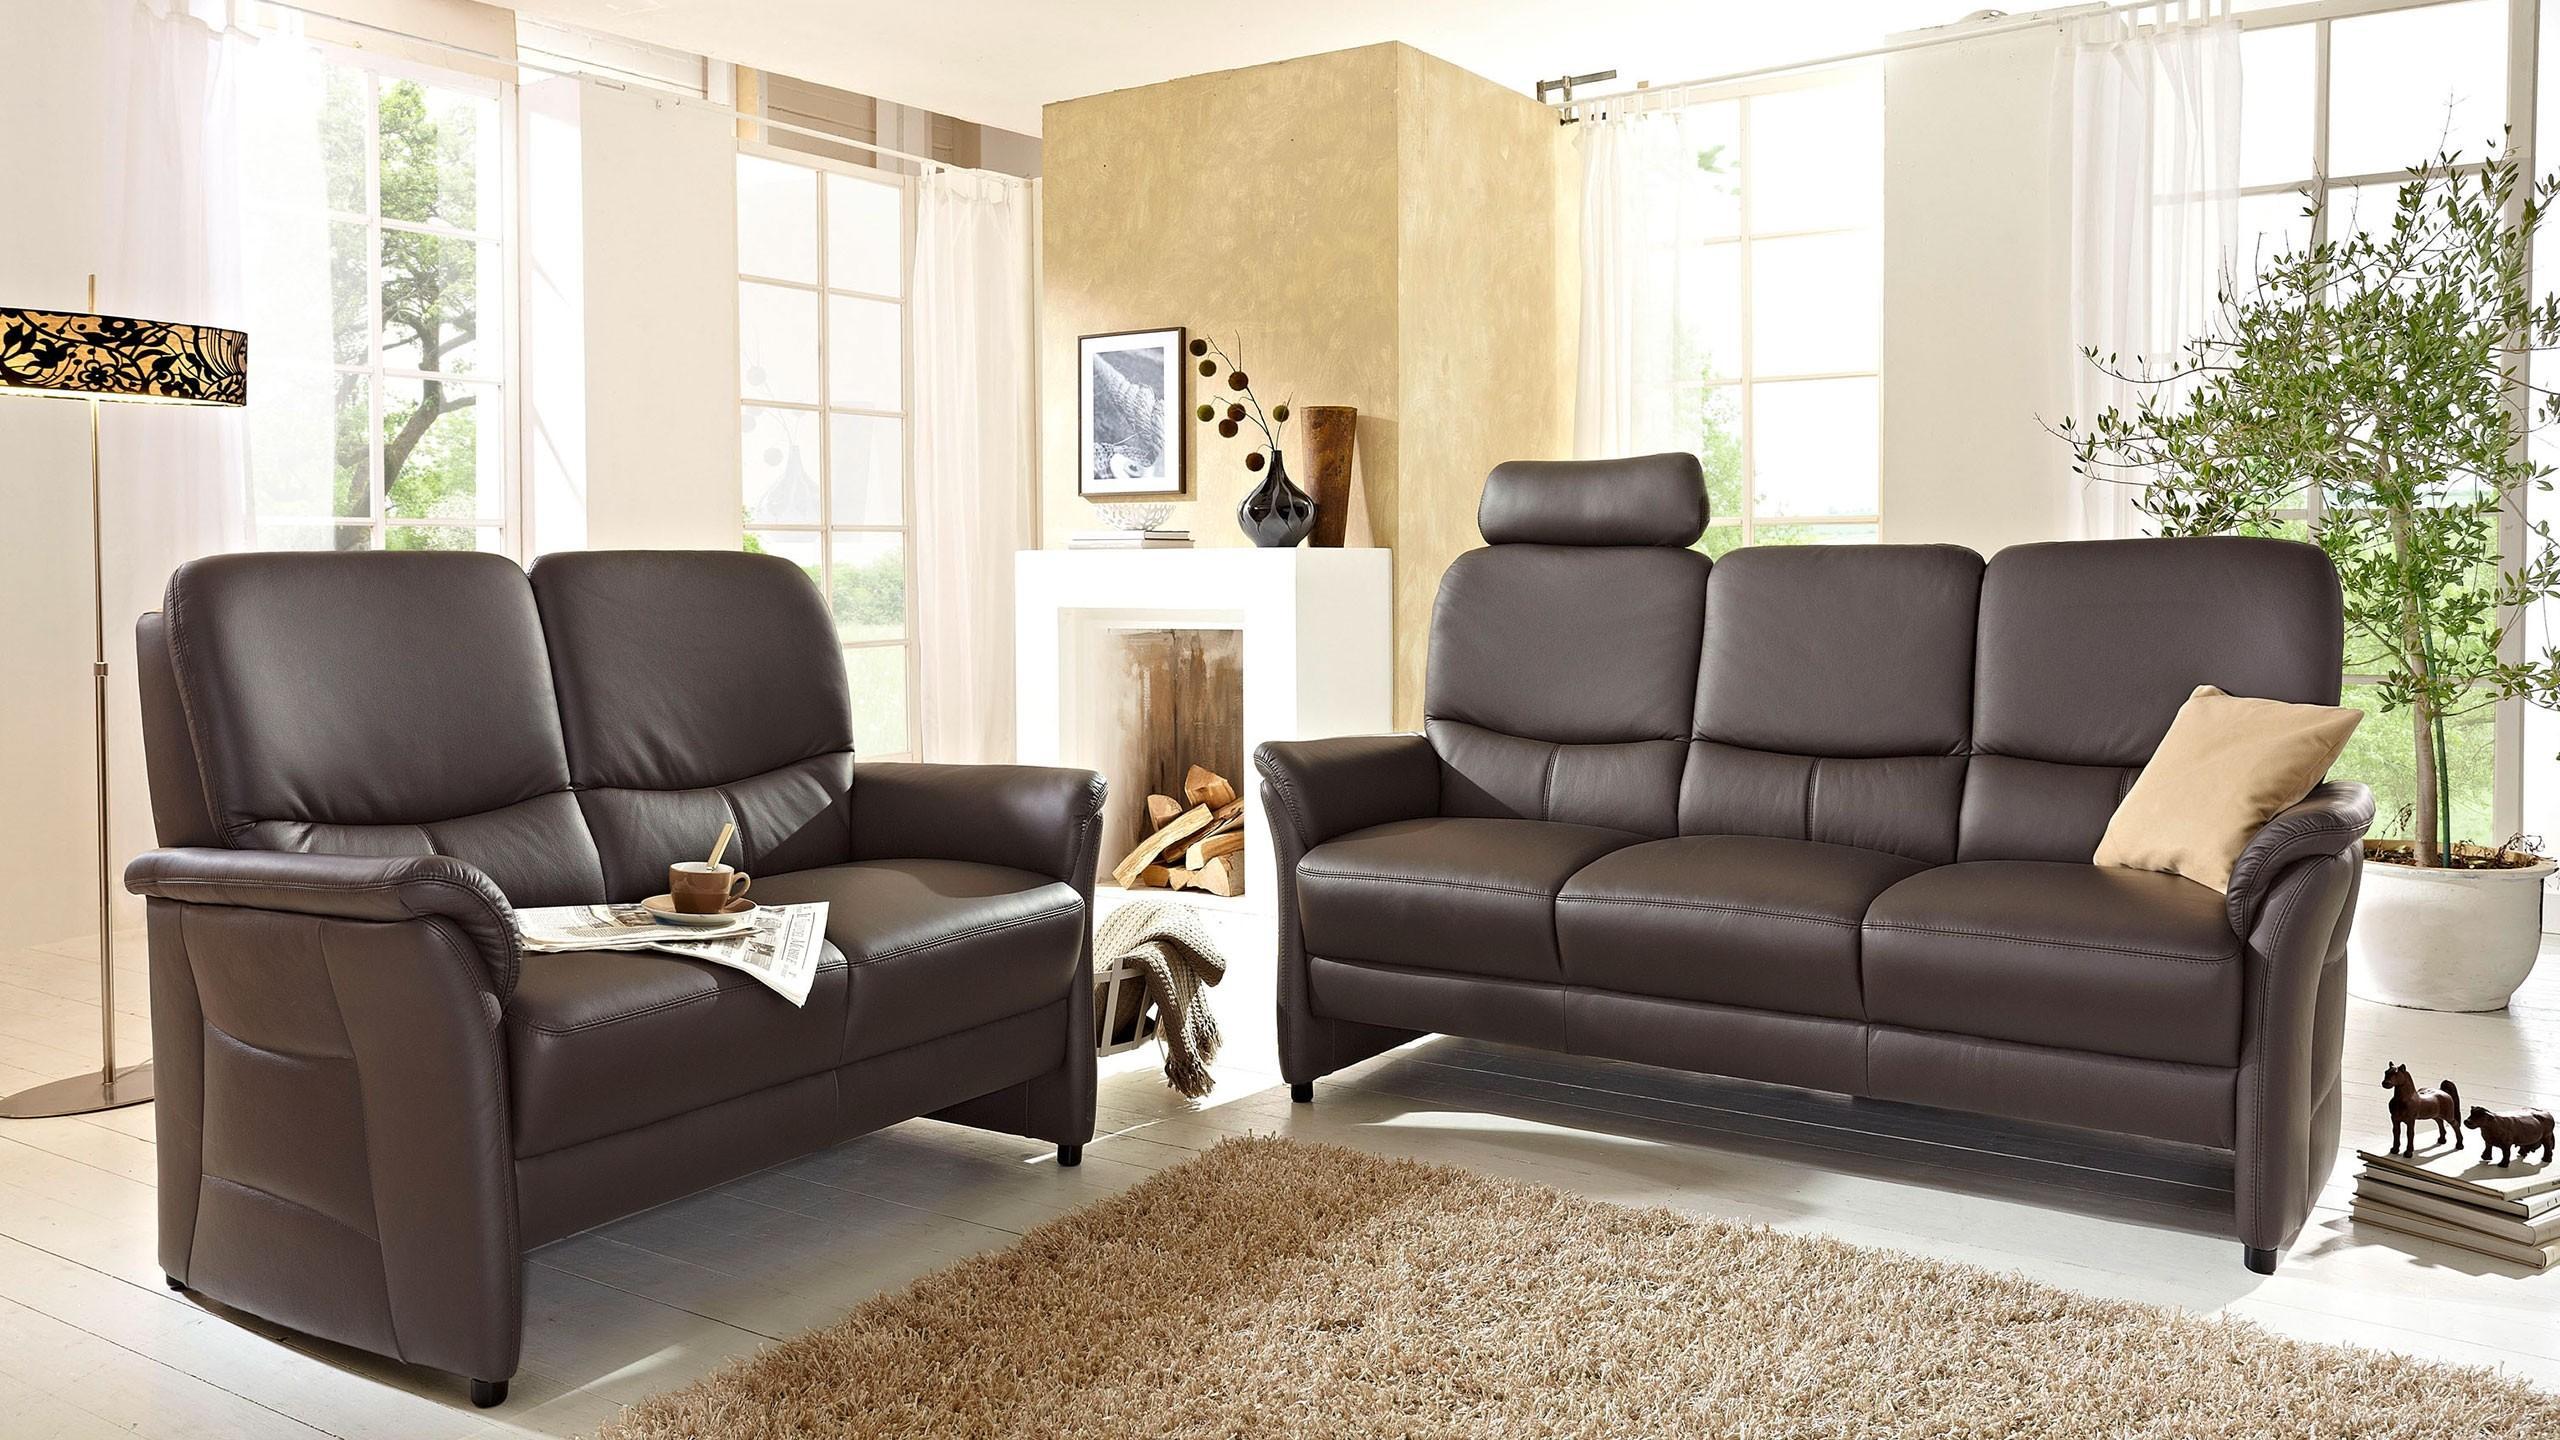 Full Size of Sofa Garnituren 3 2 1 Garnitur 3 Teilig Leder Billiger Rundecke Couch Ikea Günstig Kaufen Bullfrog Türkis Kolonialstil U Form Rattan Garten Bunt Landhaus Sofa Sofa Garnitur